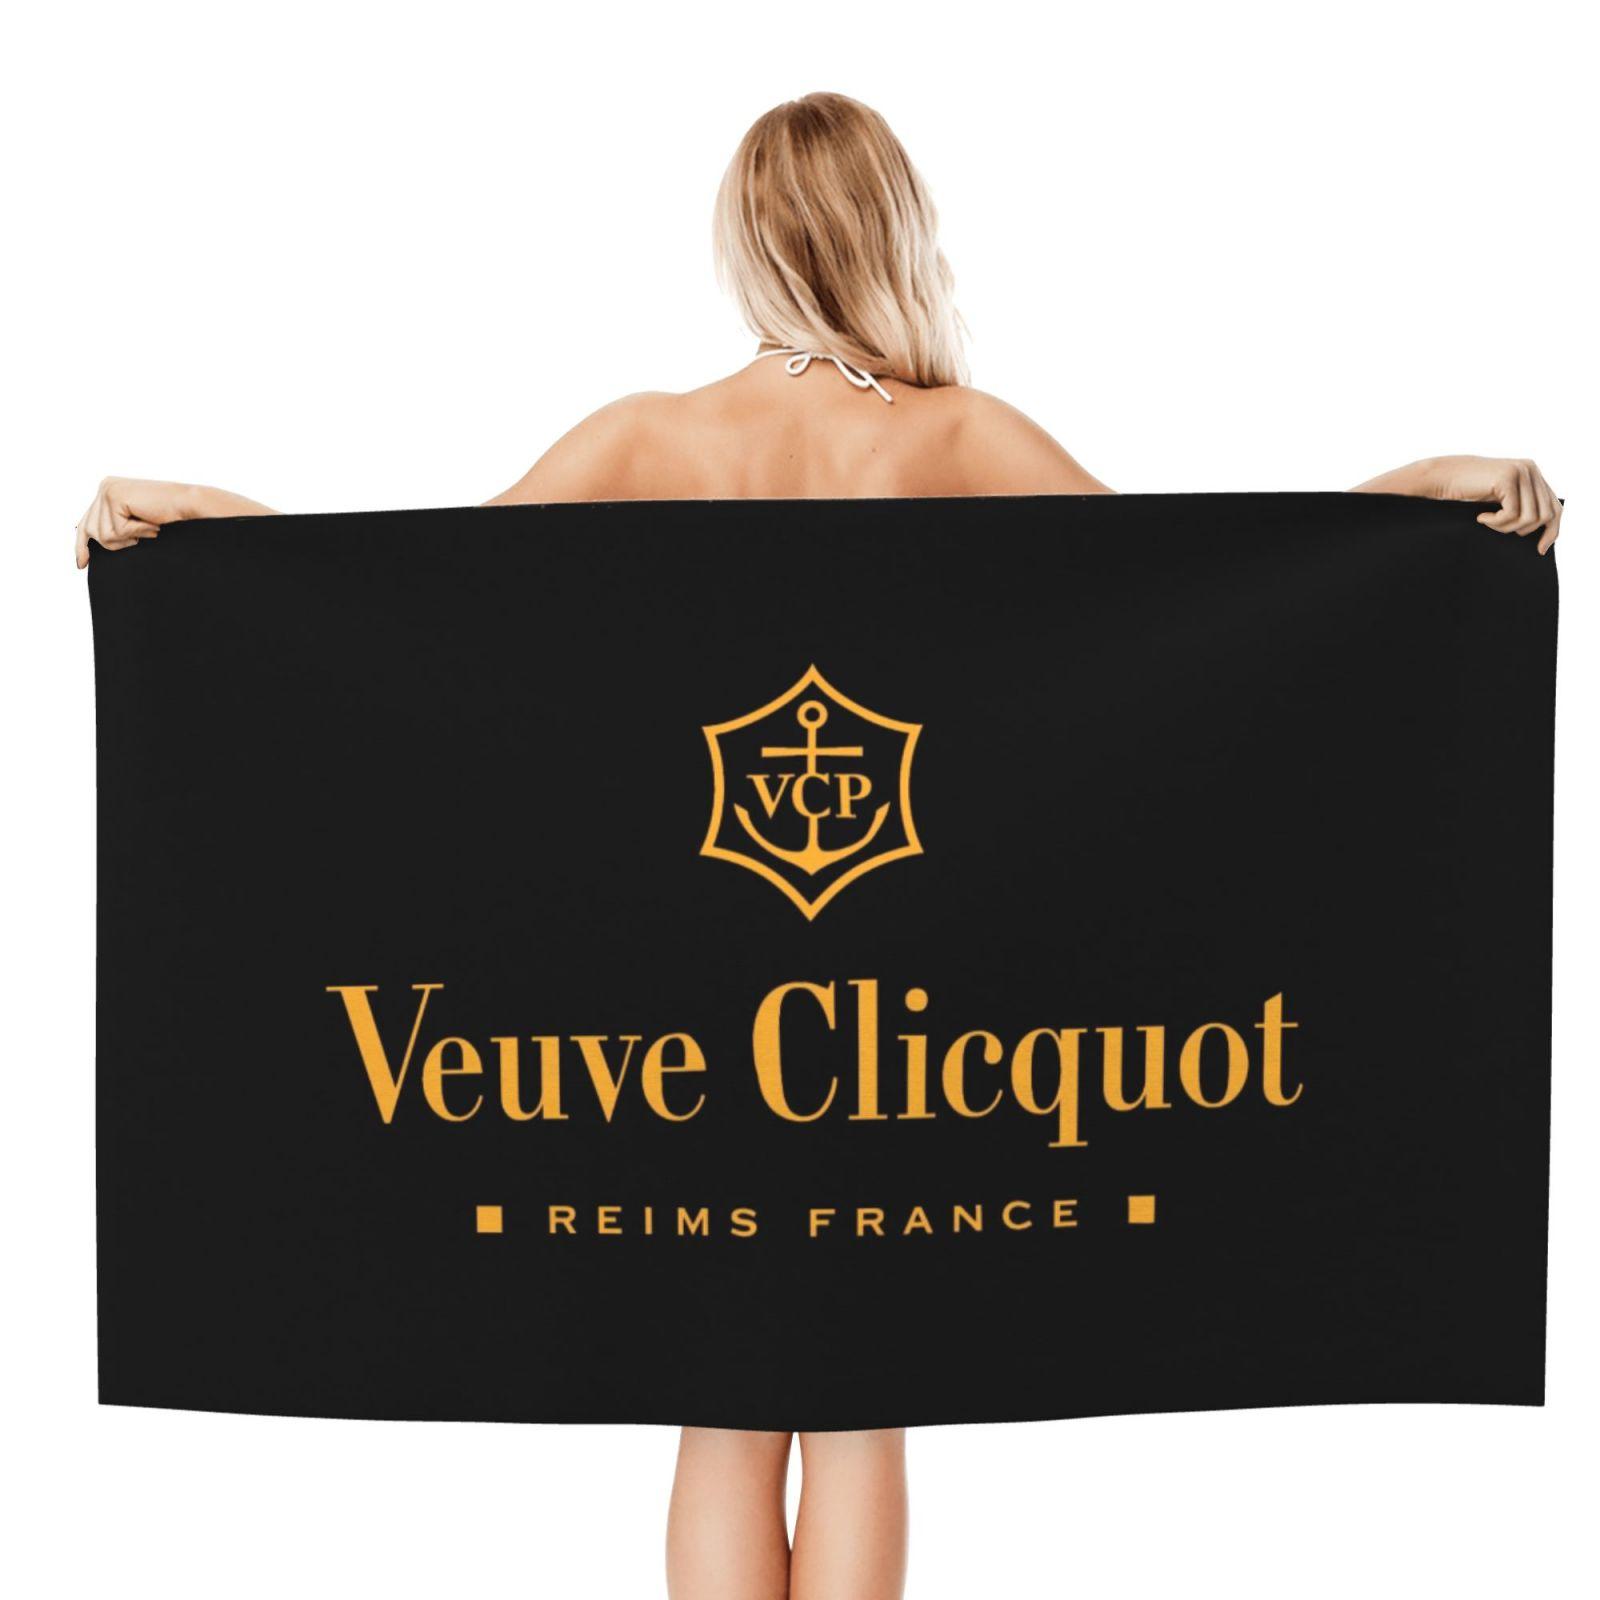 Veuve Clicquot مناشف الشاطئ الشمبانيا ، XL فوط استحمام ، تصميم شخصي ، سحابة الرمال الفاخرة مناشف الشاطئ _ mystyj025